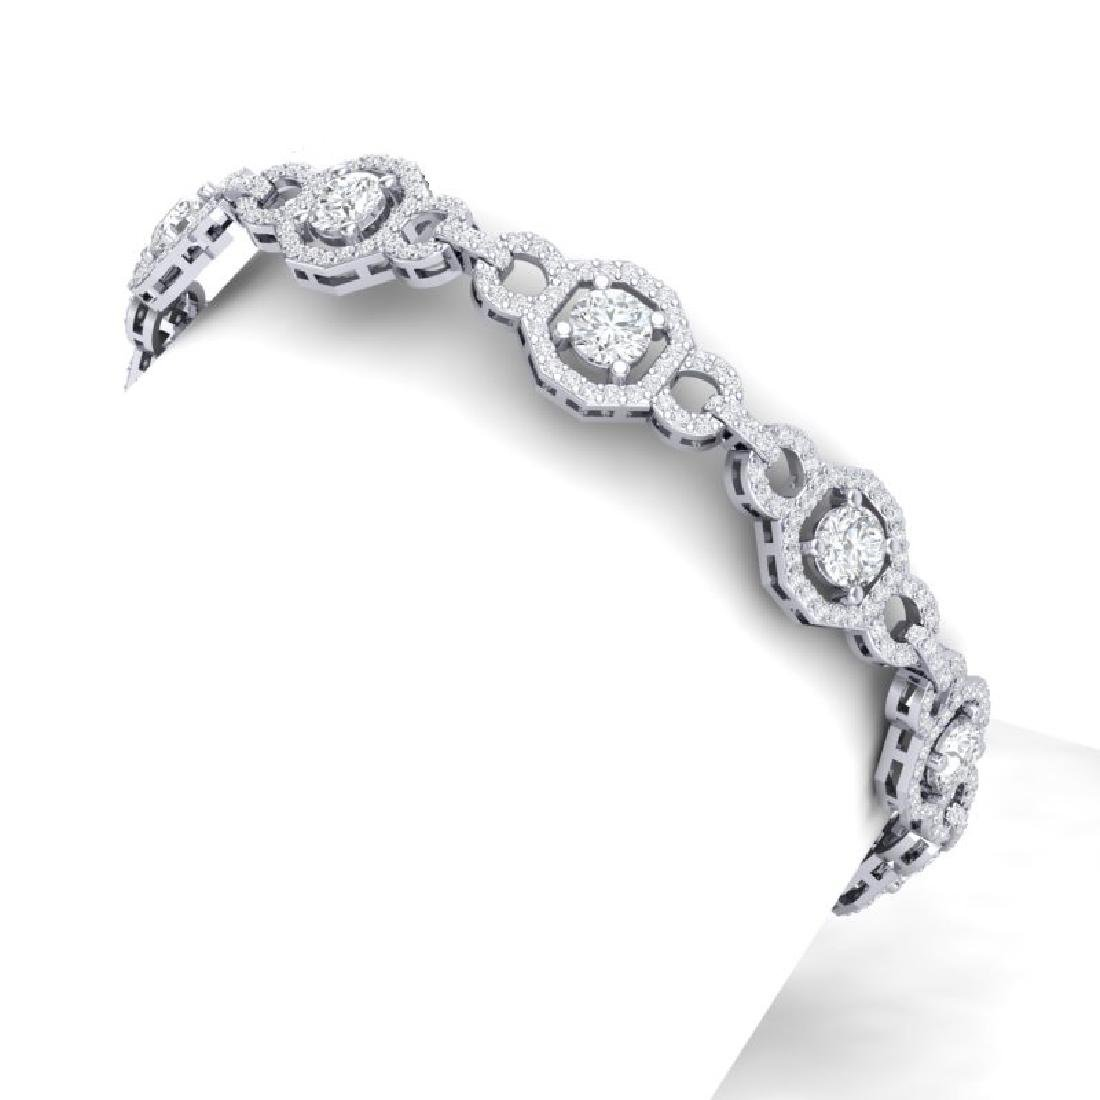 12 CTW Certified SI/I Diamond Halo Bracelet 18K White